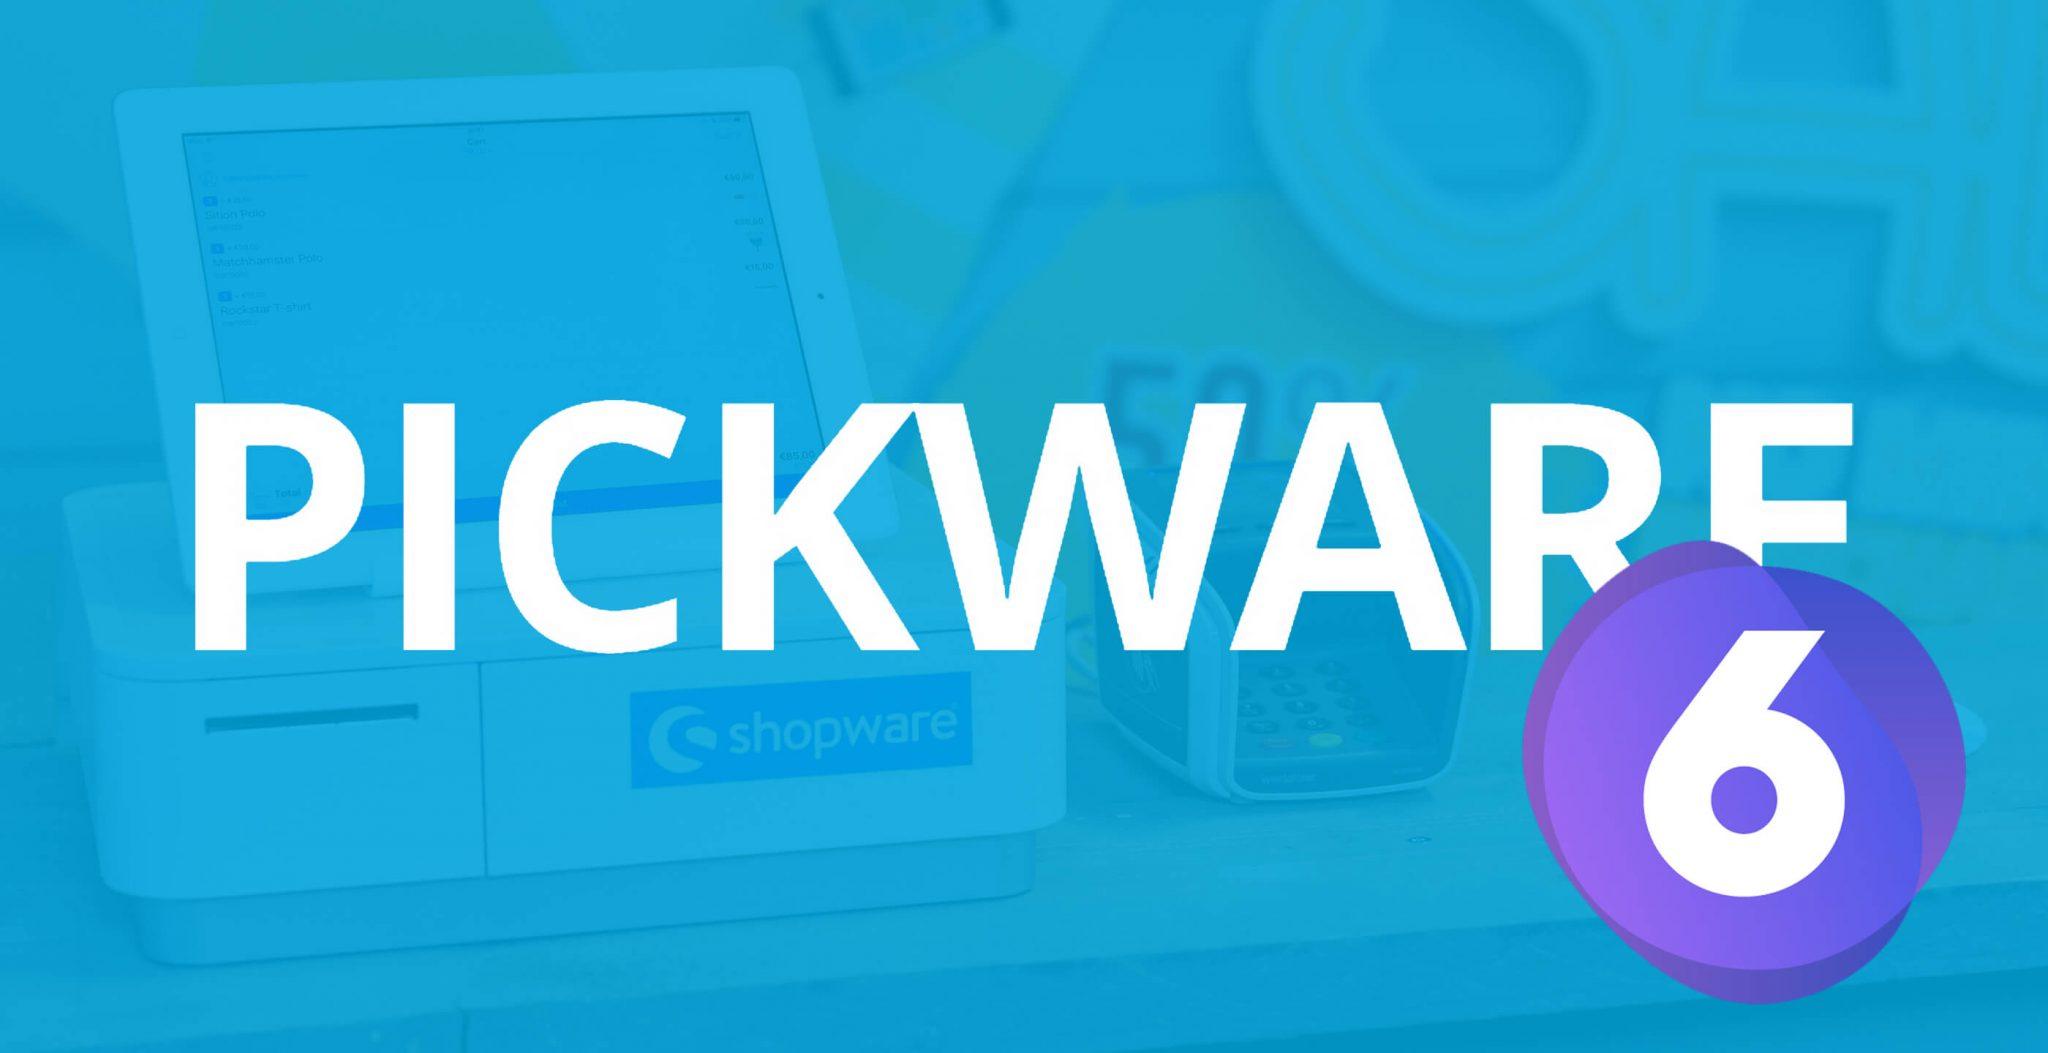 Pickware in Shopware 6